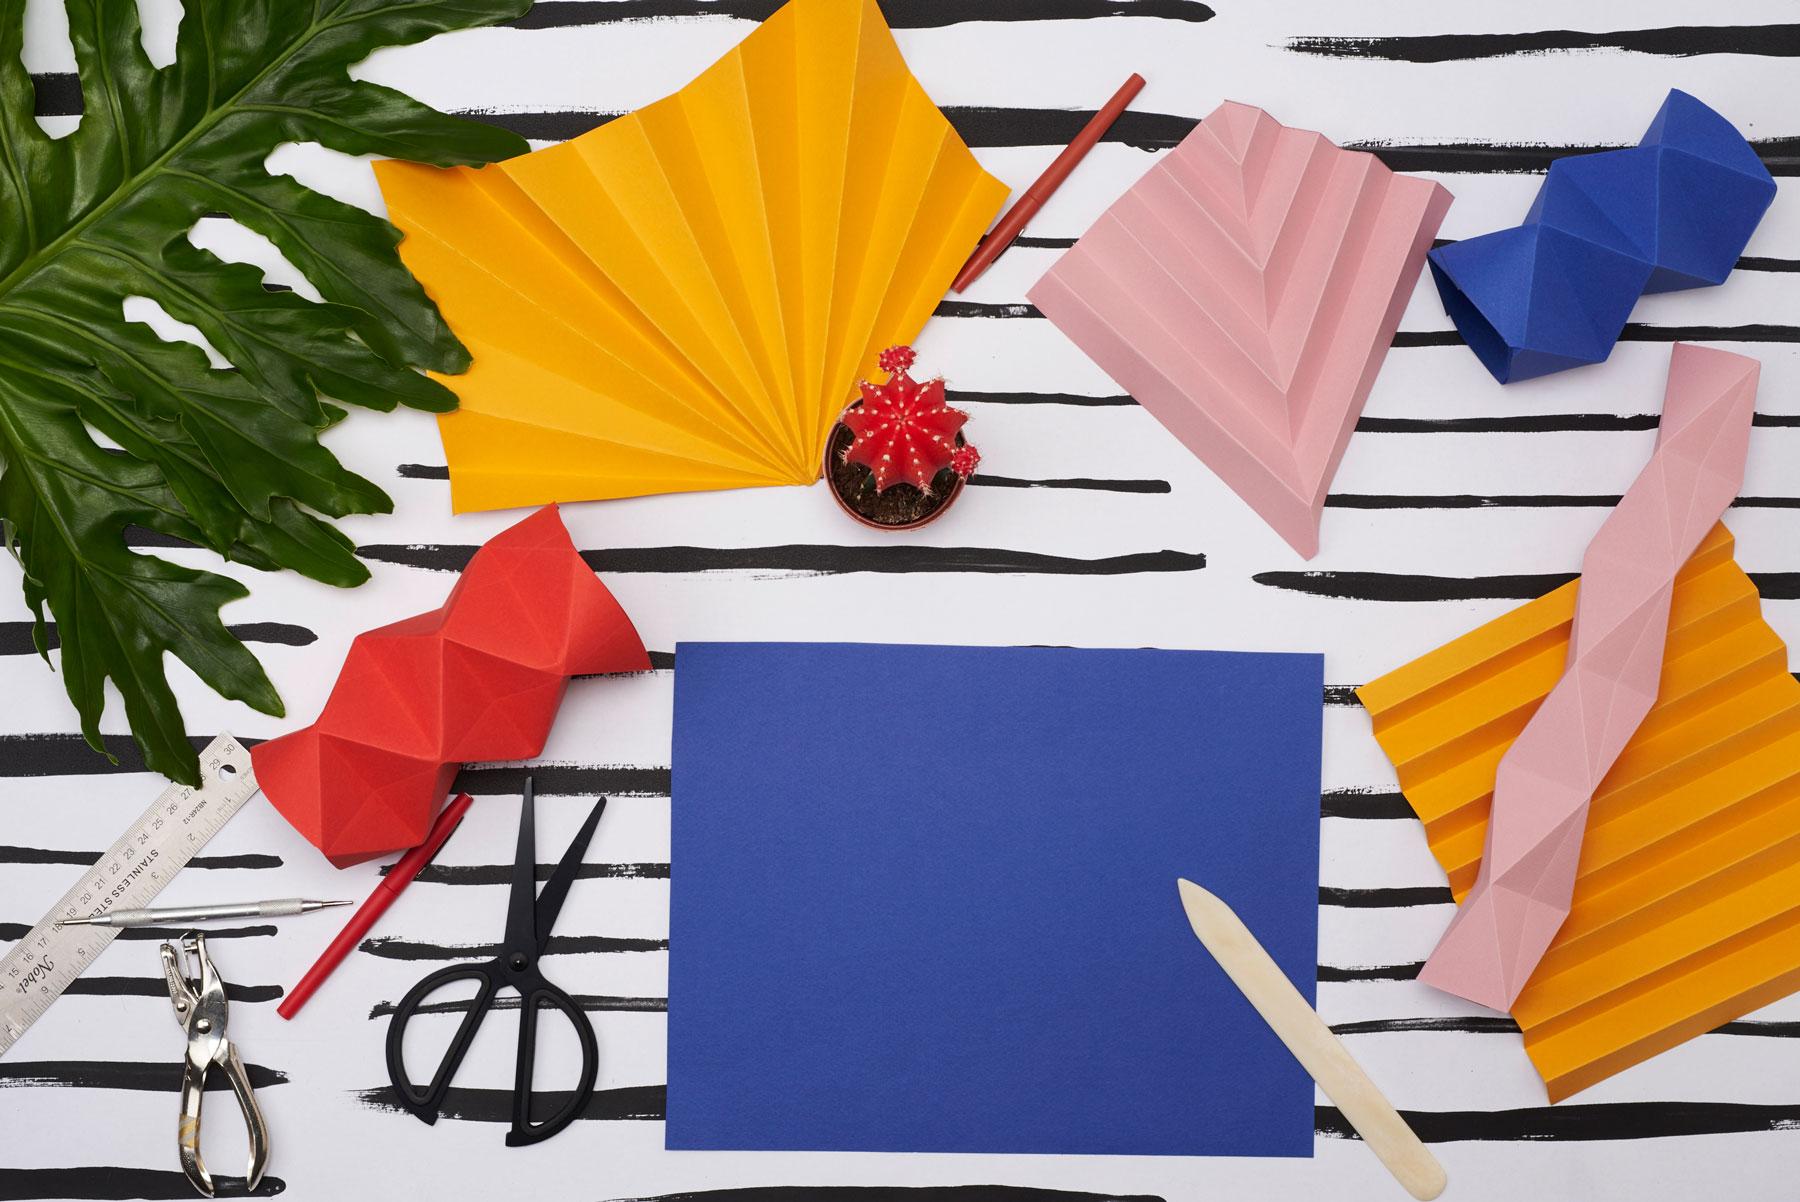 miss-cloudy-atelier-2017-pliage-folding-paper-origami-101-workshop-2.jpg